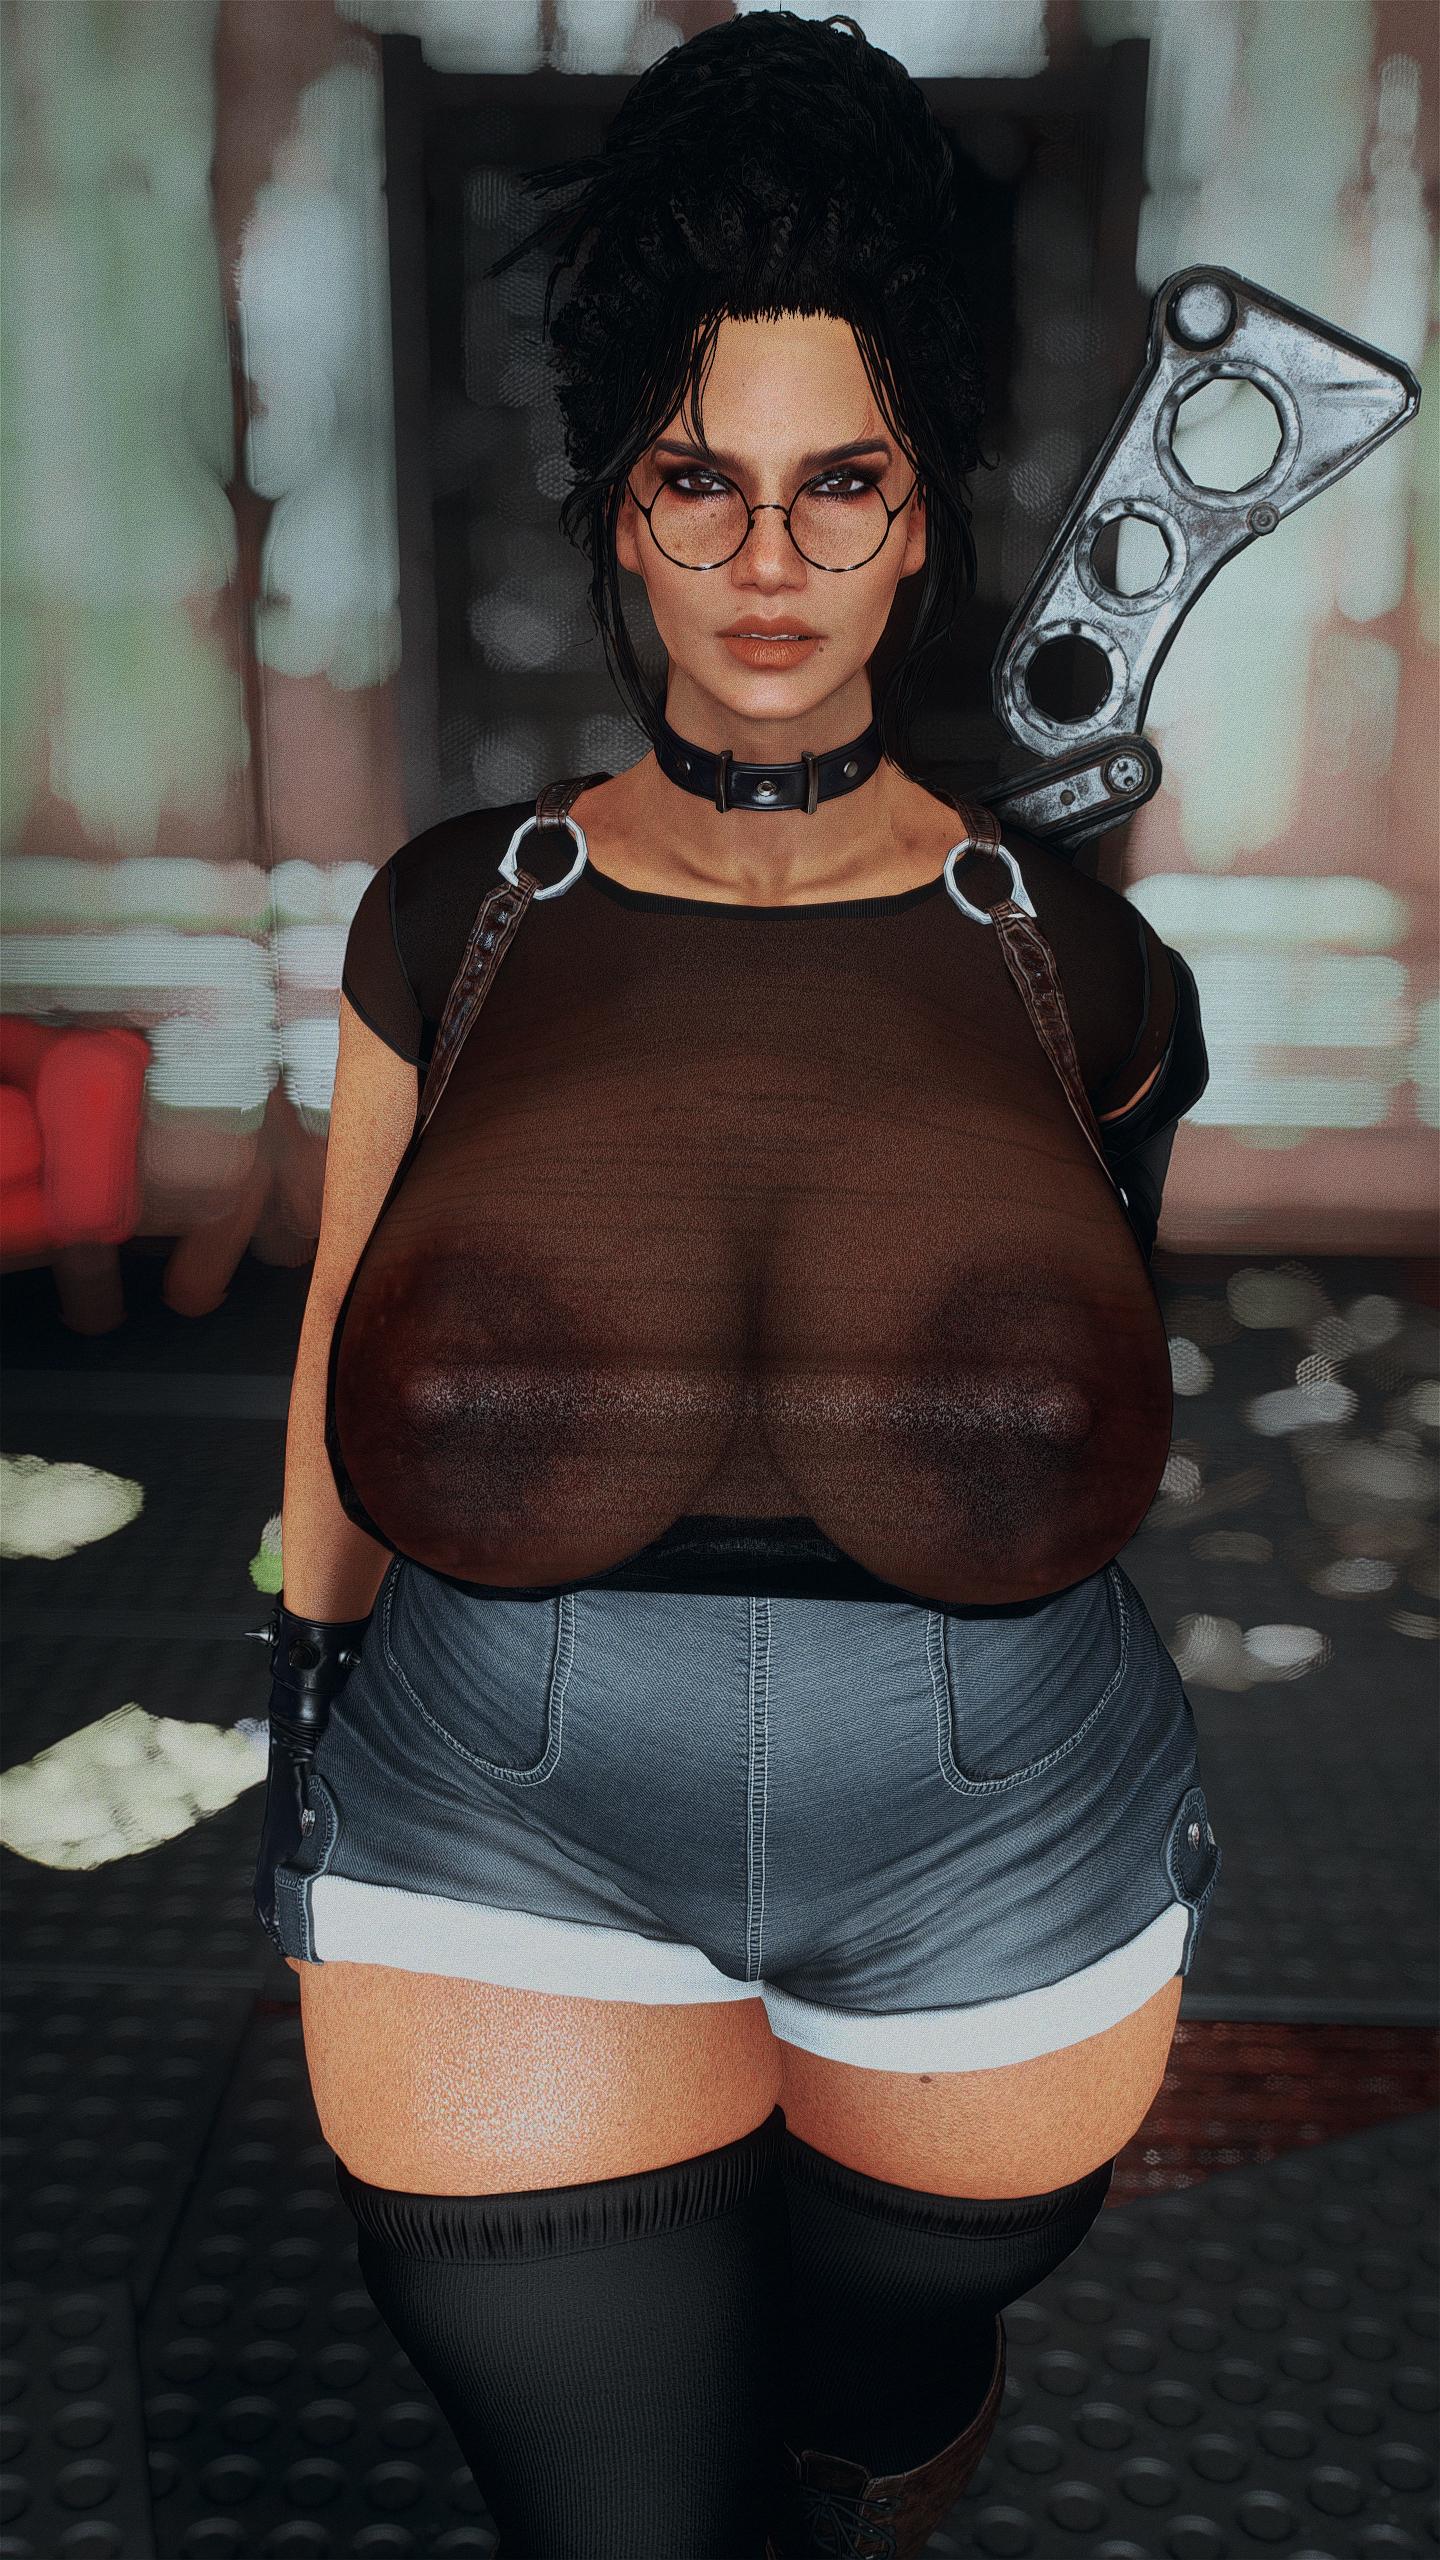 Fallout4-2021-03-05-22-30-58.jpg